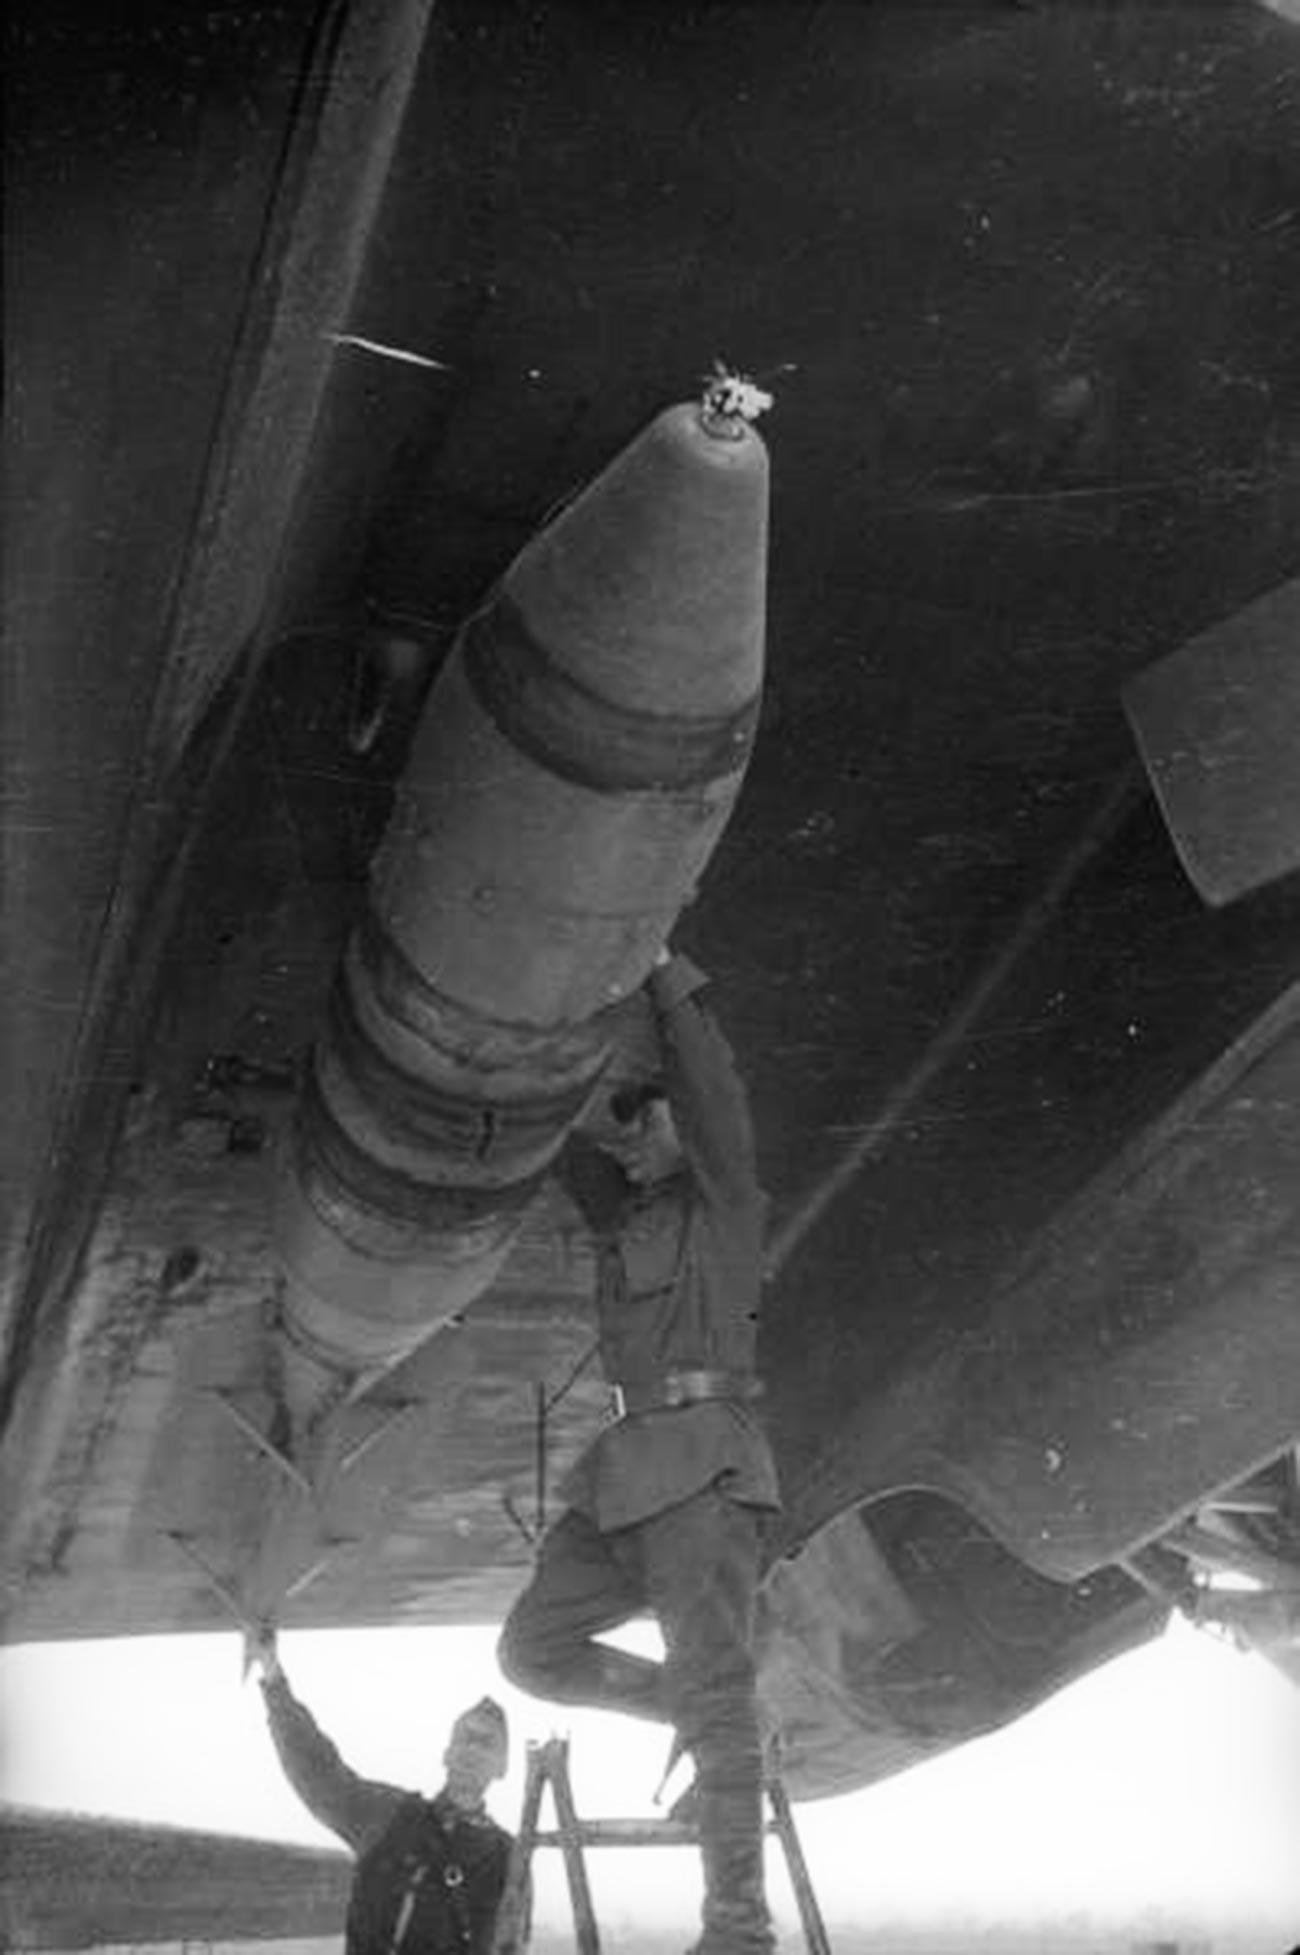 Jurišni bombniki Pe-2